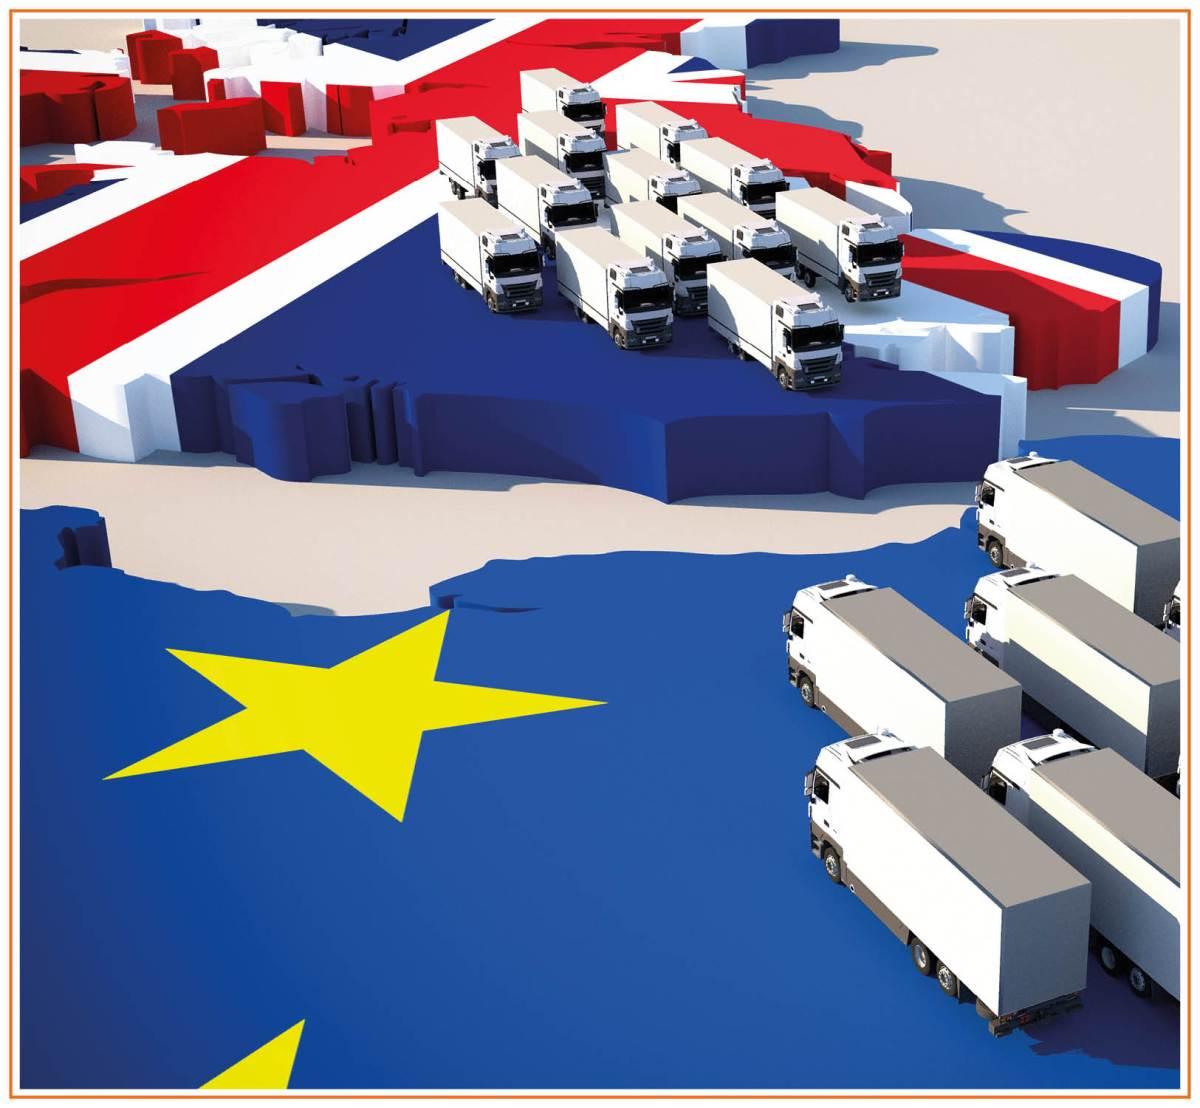 https://i1.wp.com/haultech.co.uk/wp-content/uploads/2020/11/HaulTech-Brexit-European-Operating-Requirements-Update-2021.jpg?fit=1200%2C1108&ssl=1